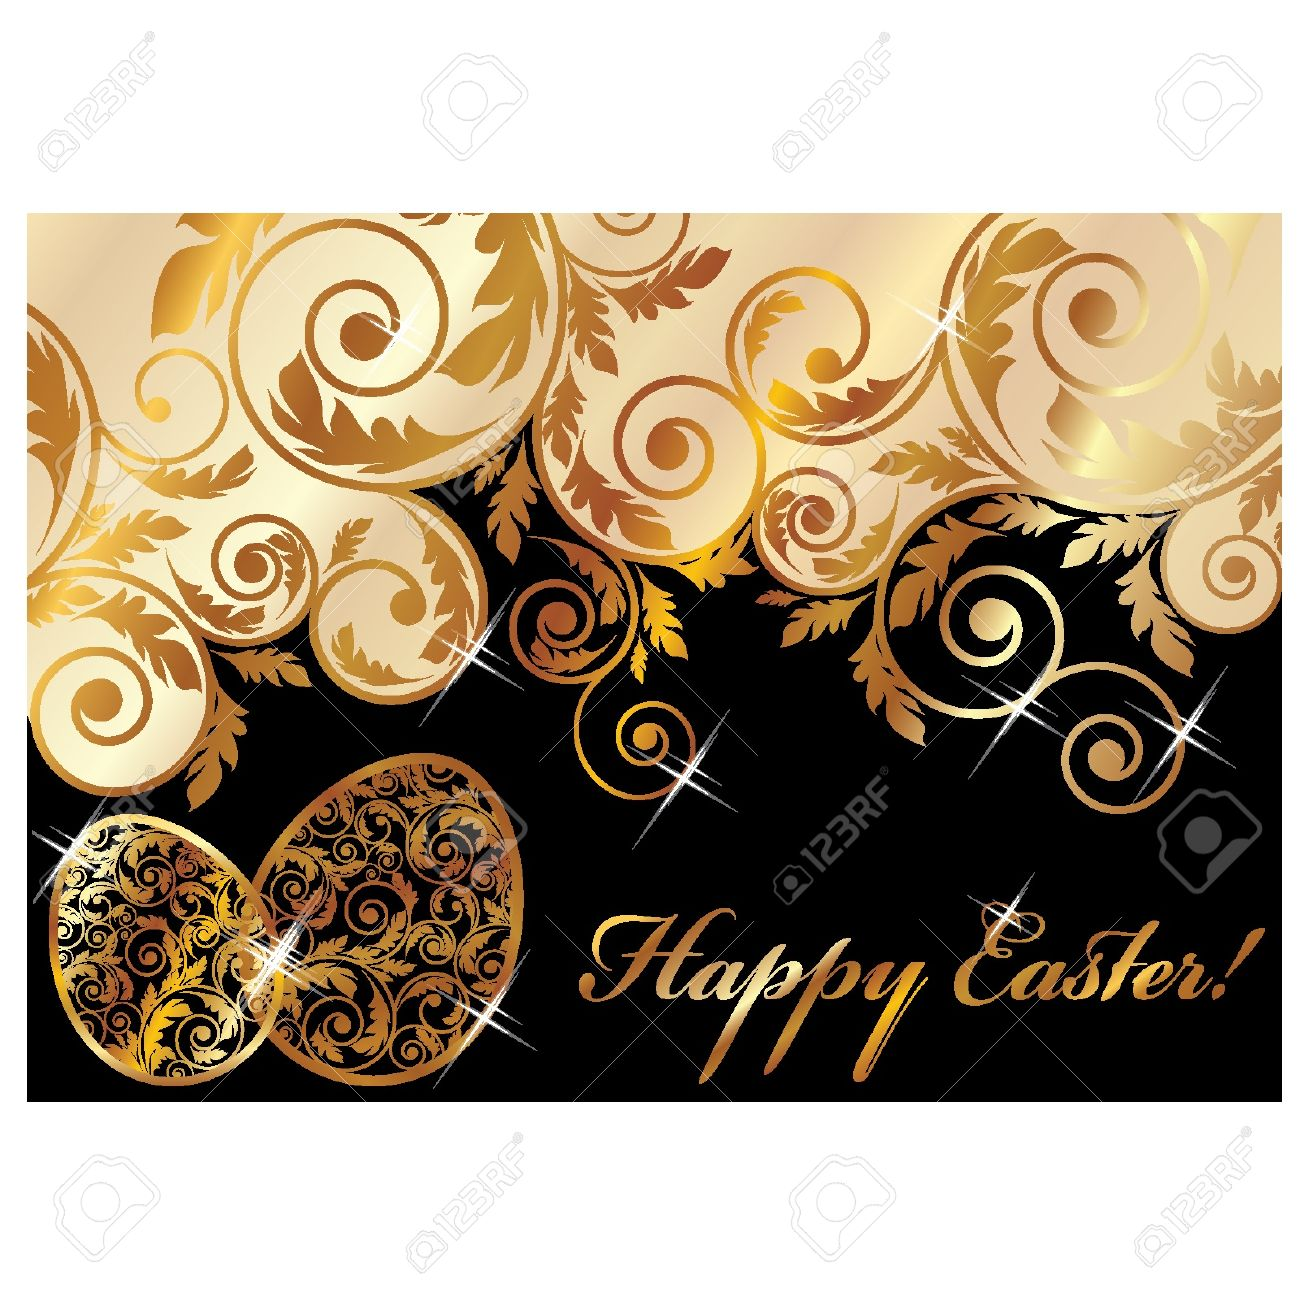 Elegant easter clipart png black and white stock Elegant Easter Banner, Vector Illustration Royalty Free Cliparts ... png black and white stock